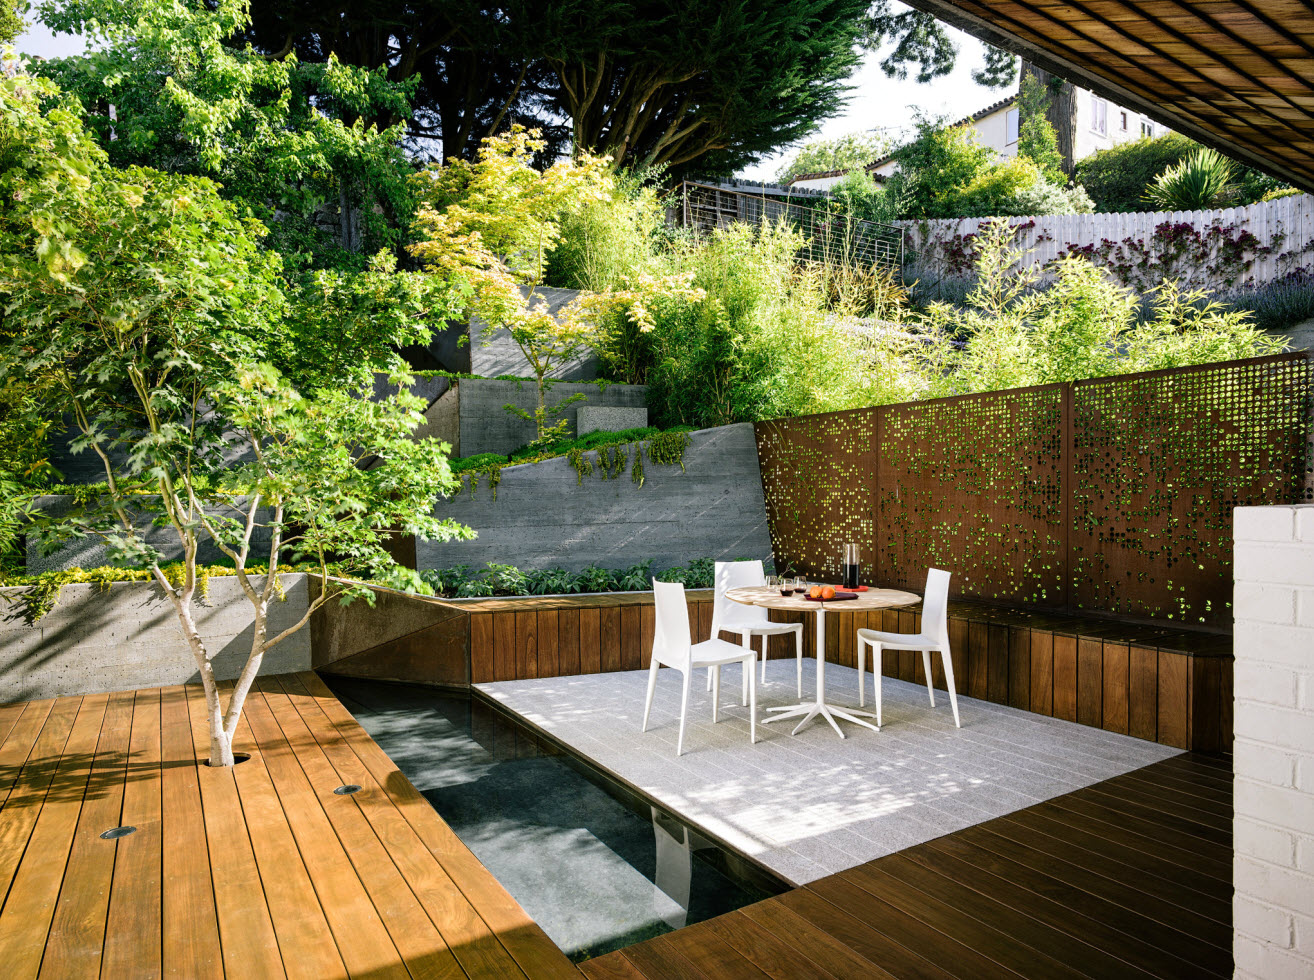 california-projects-by-mary-barensfeld_Hilgard-Garden(1) California Projects by Mary Barensfeld California Projects by Mary Barensfeld california projects by mary barensfeld Hilgard Garden1